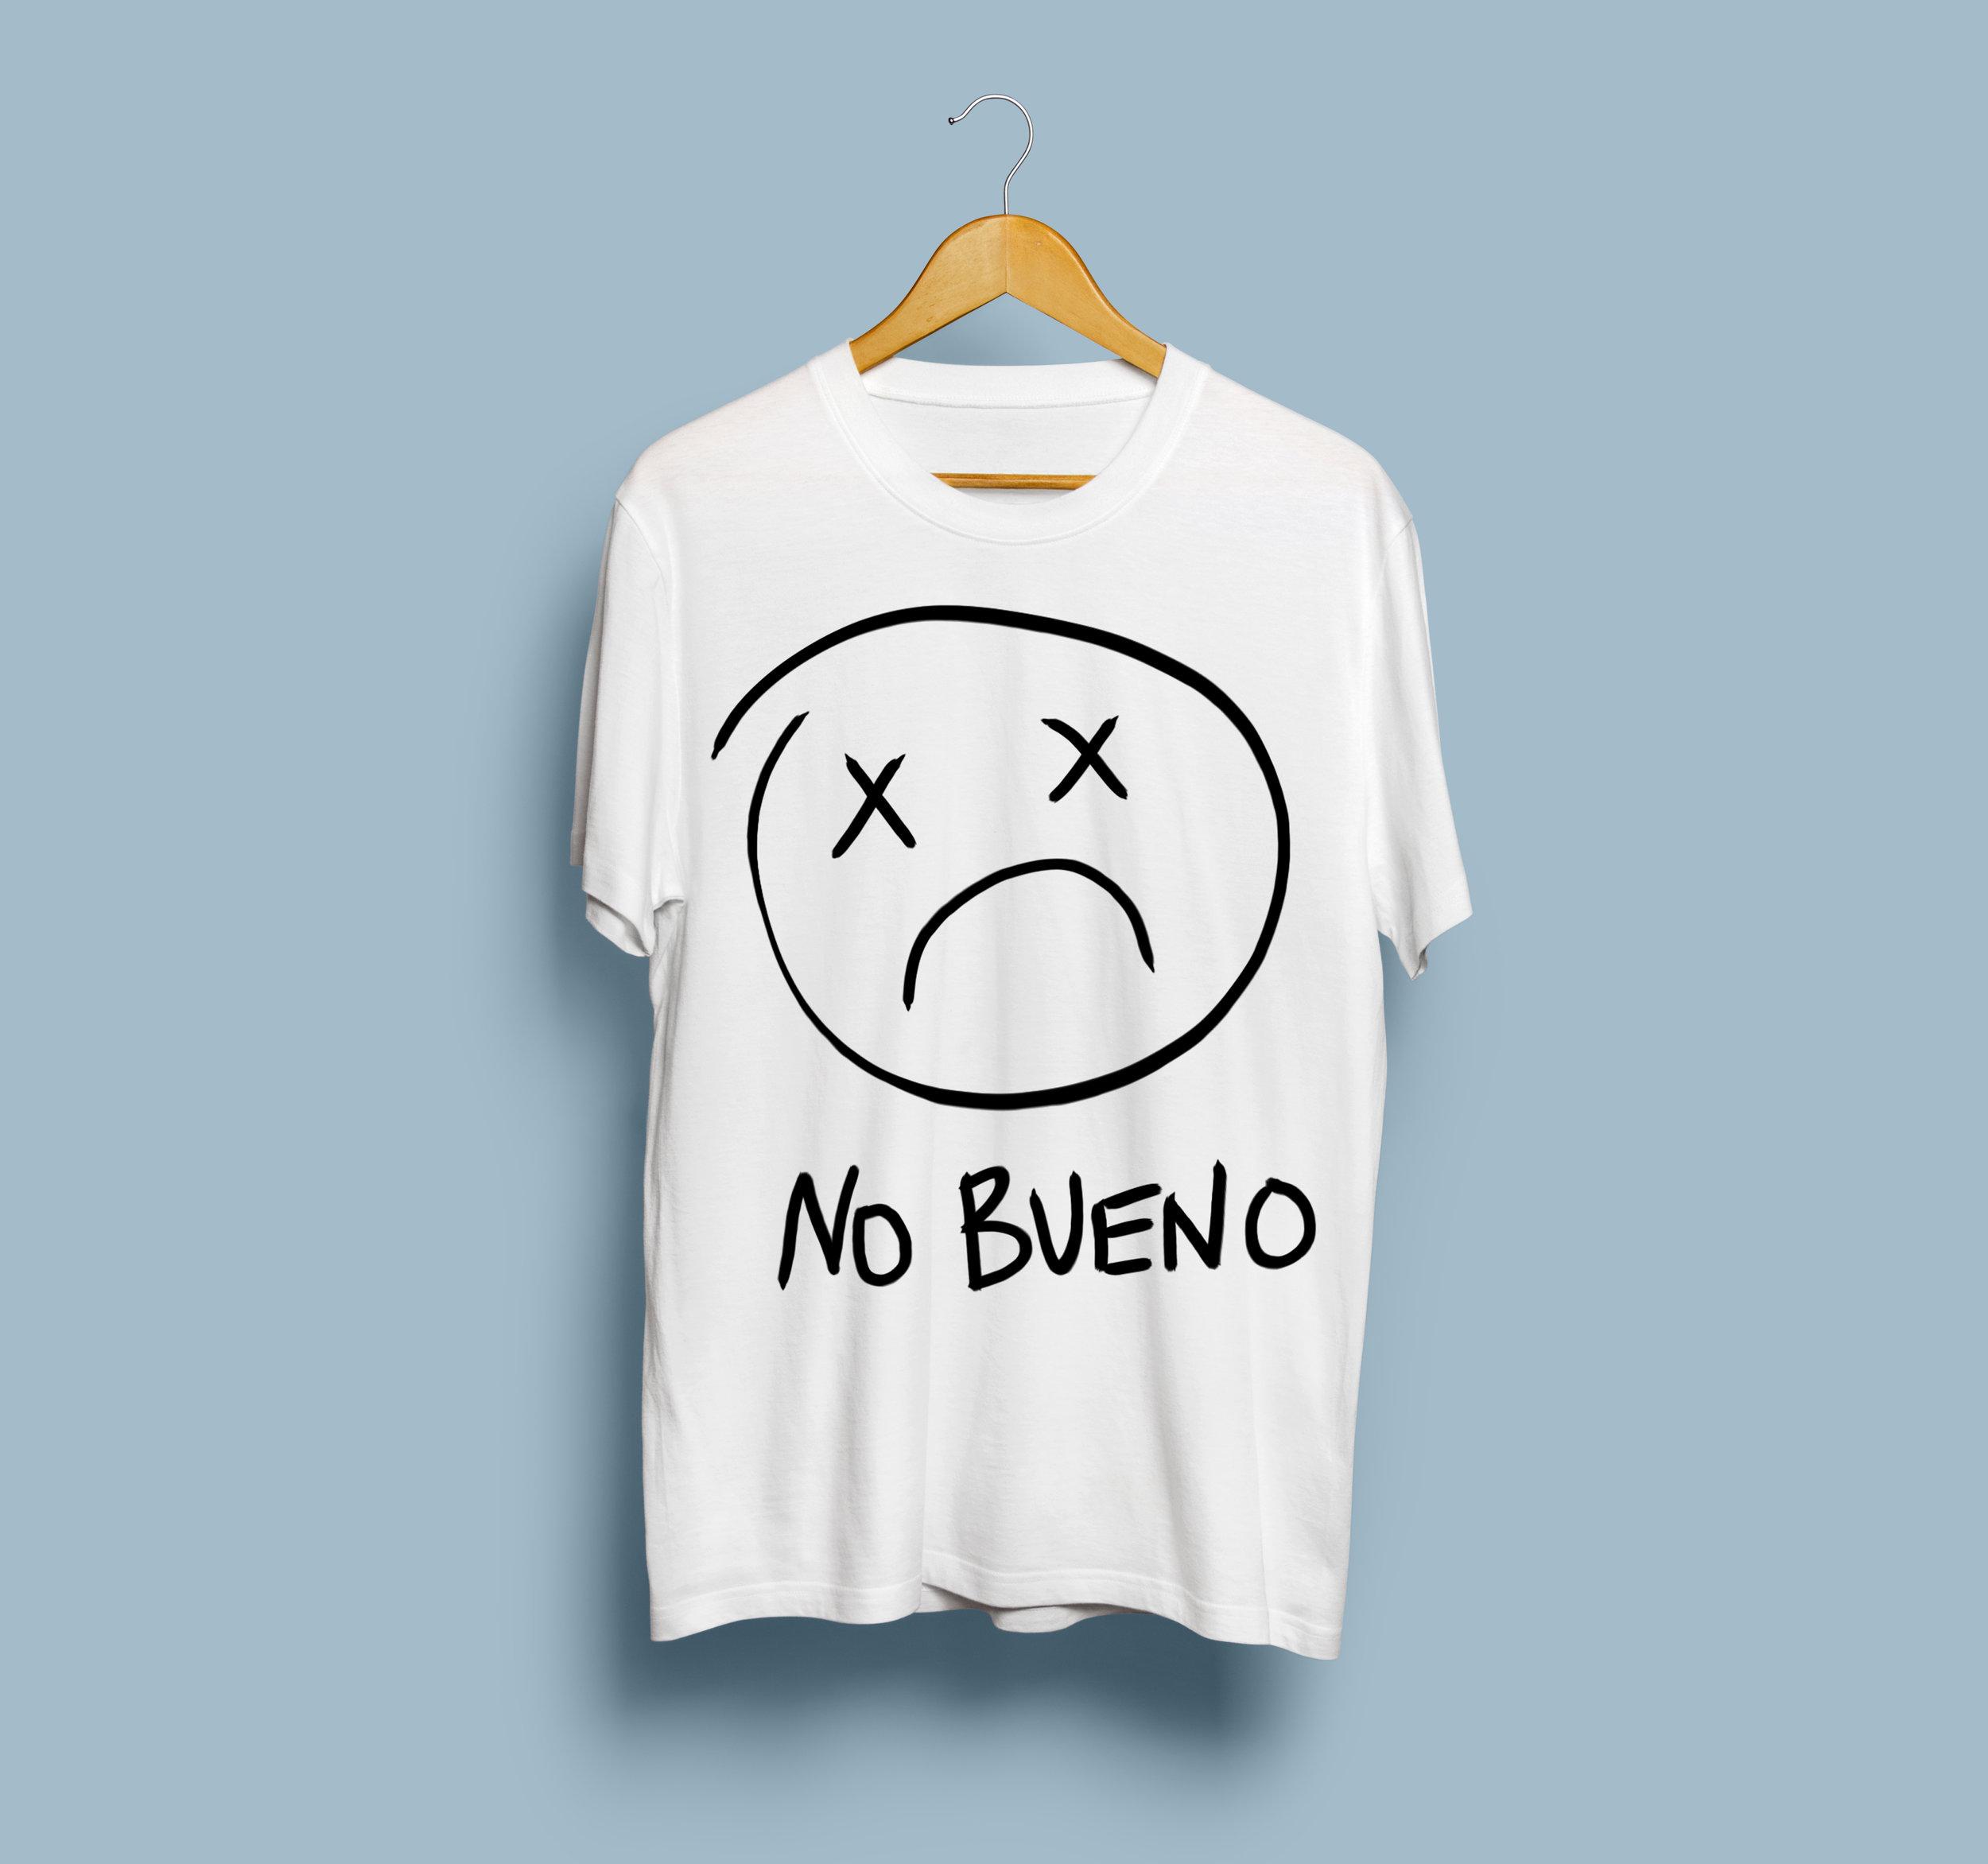 no bueno campaign / t shirt design